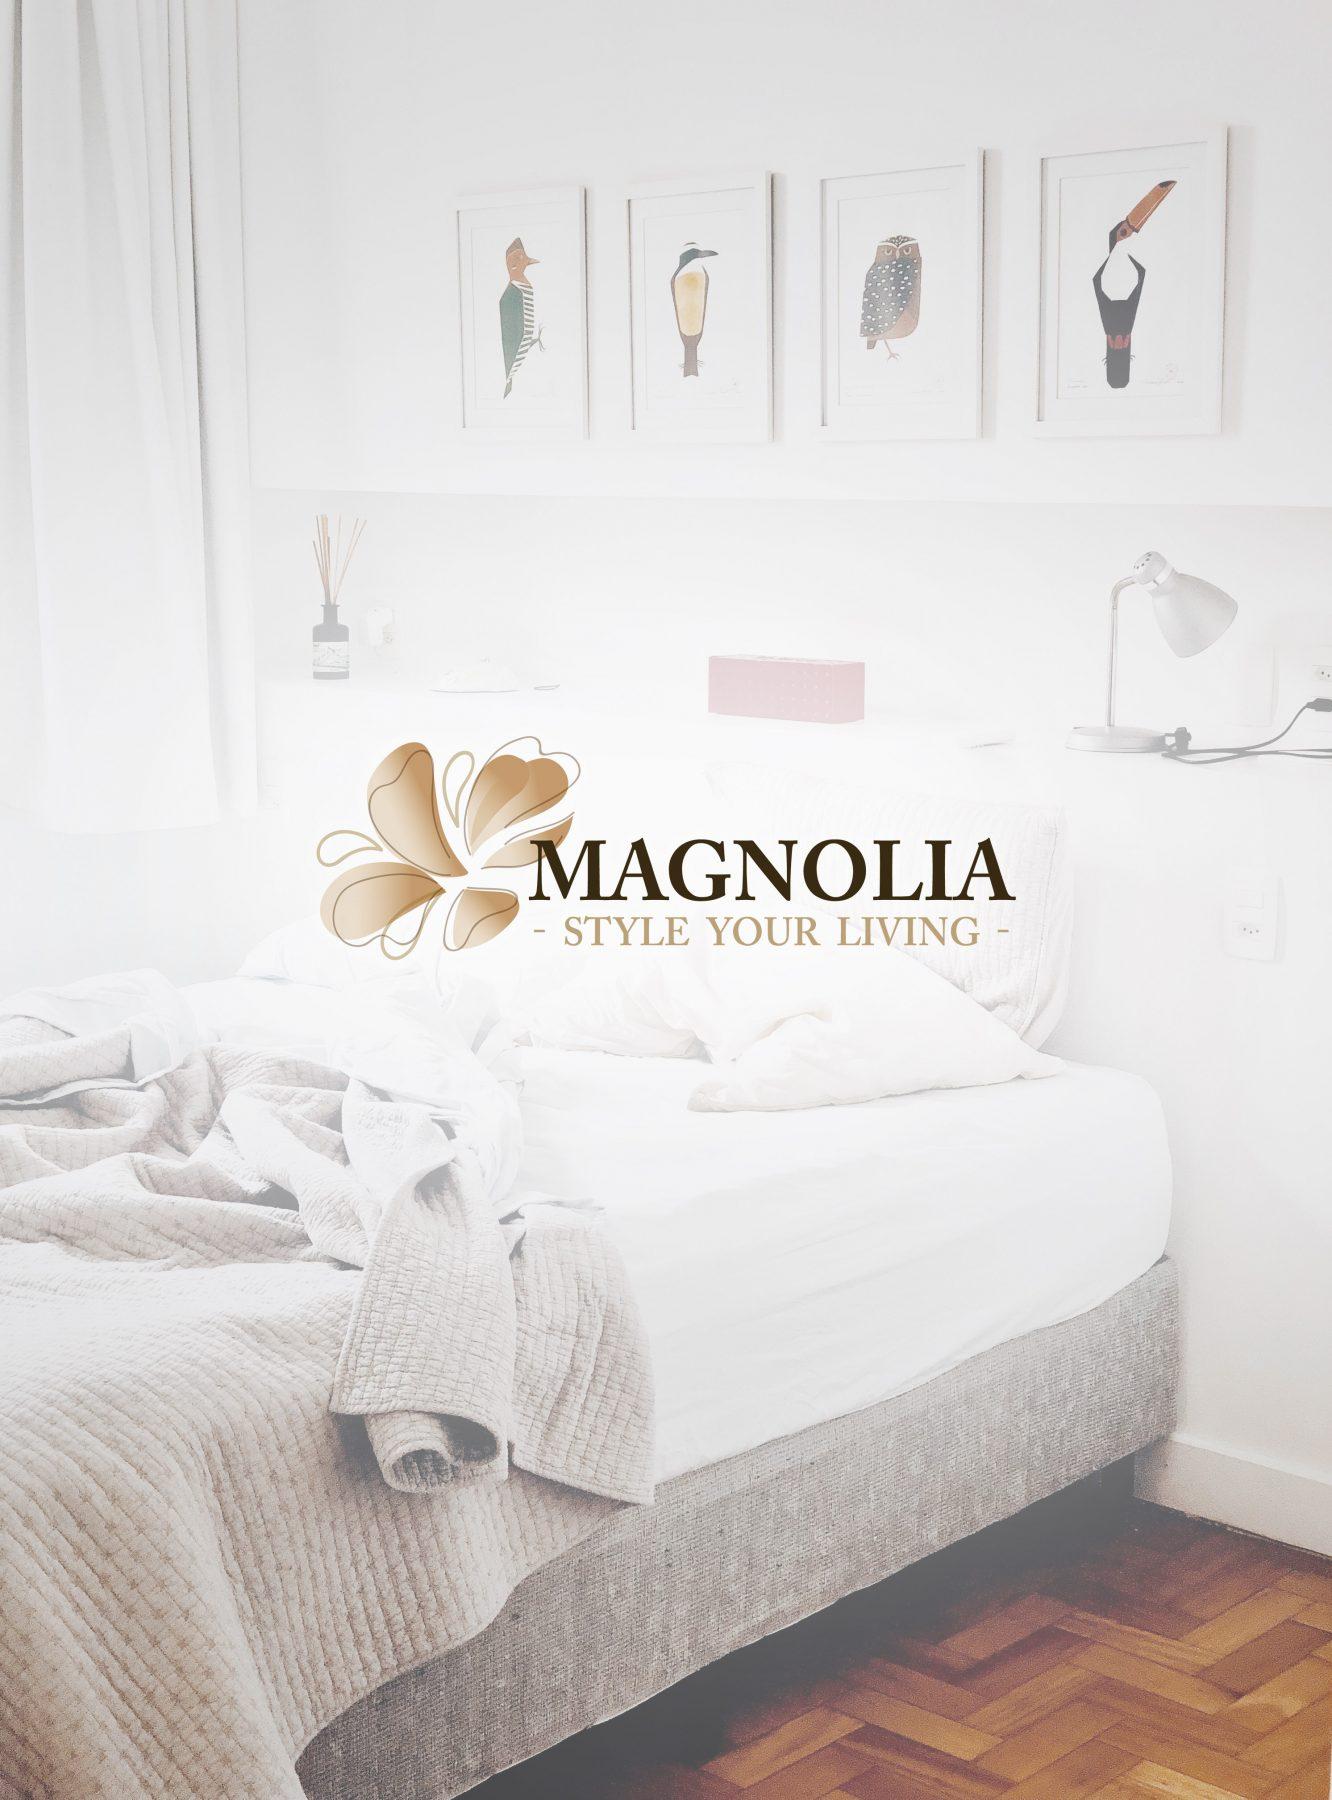 Magnolia 纺织品 品牌设计